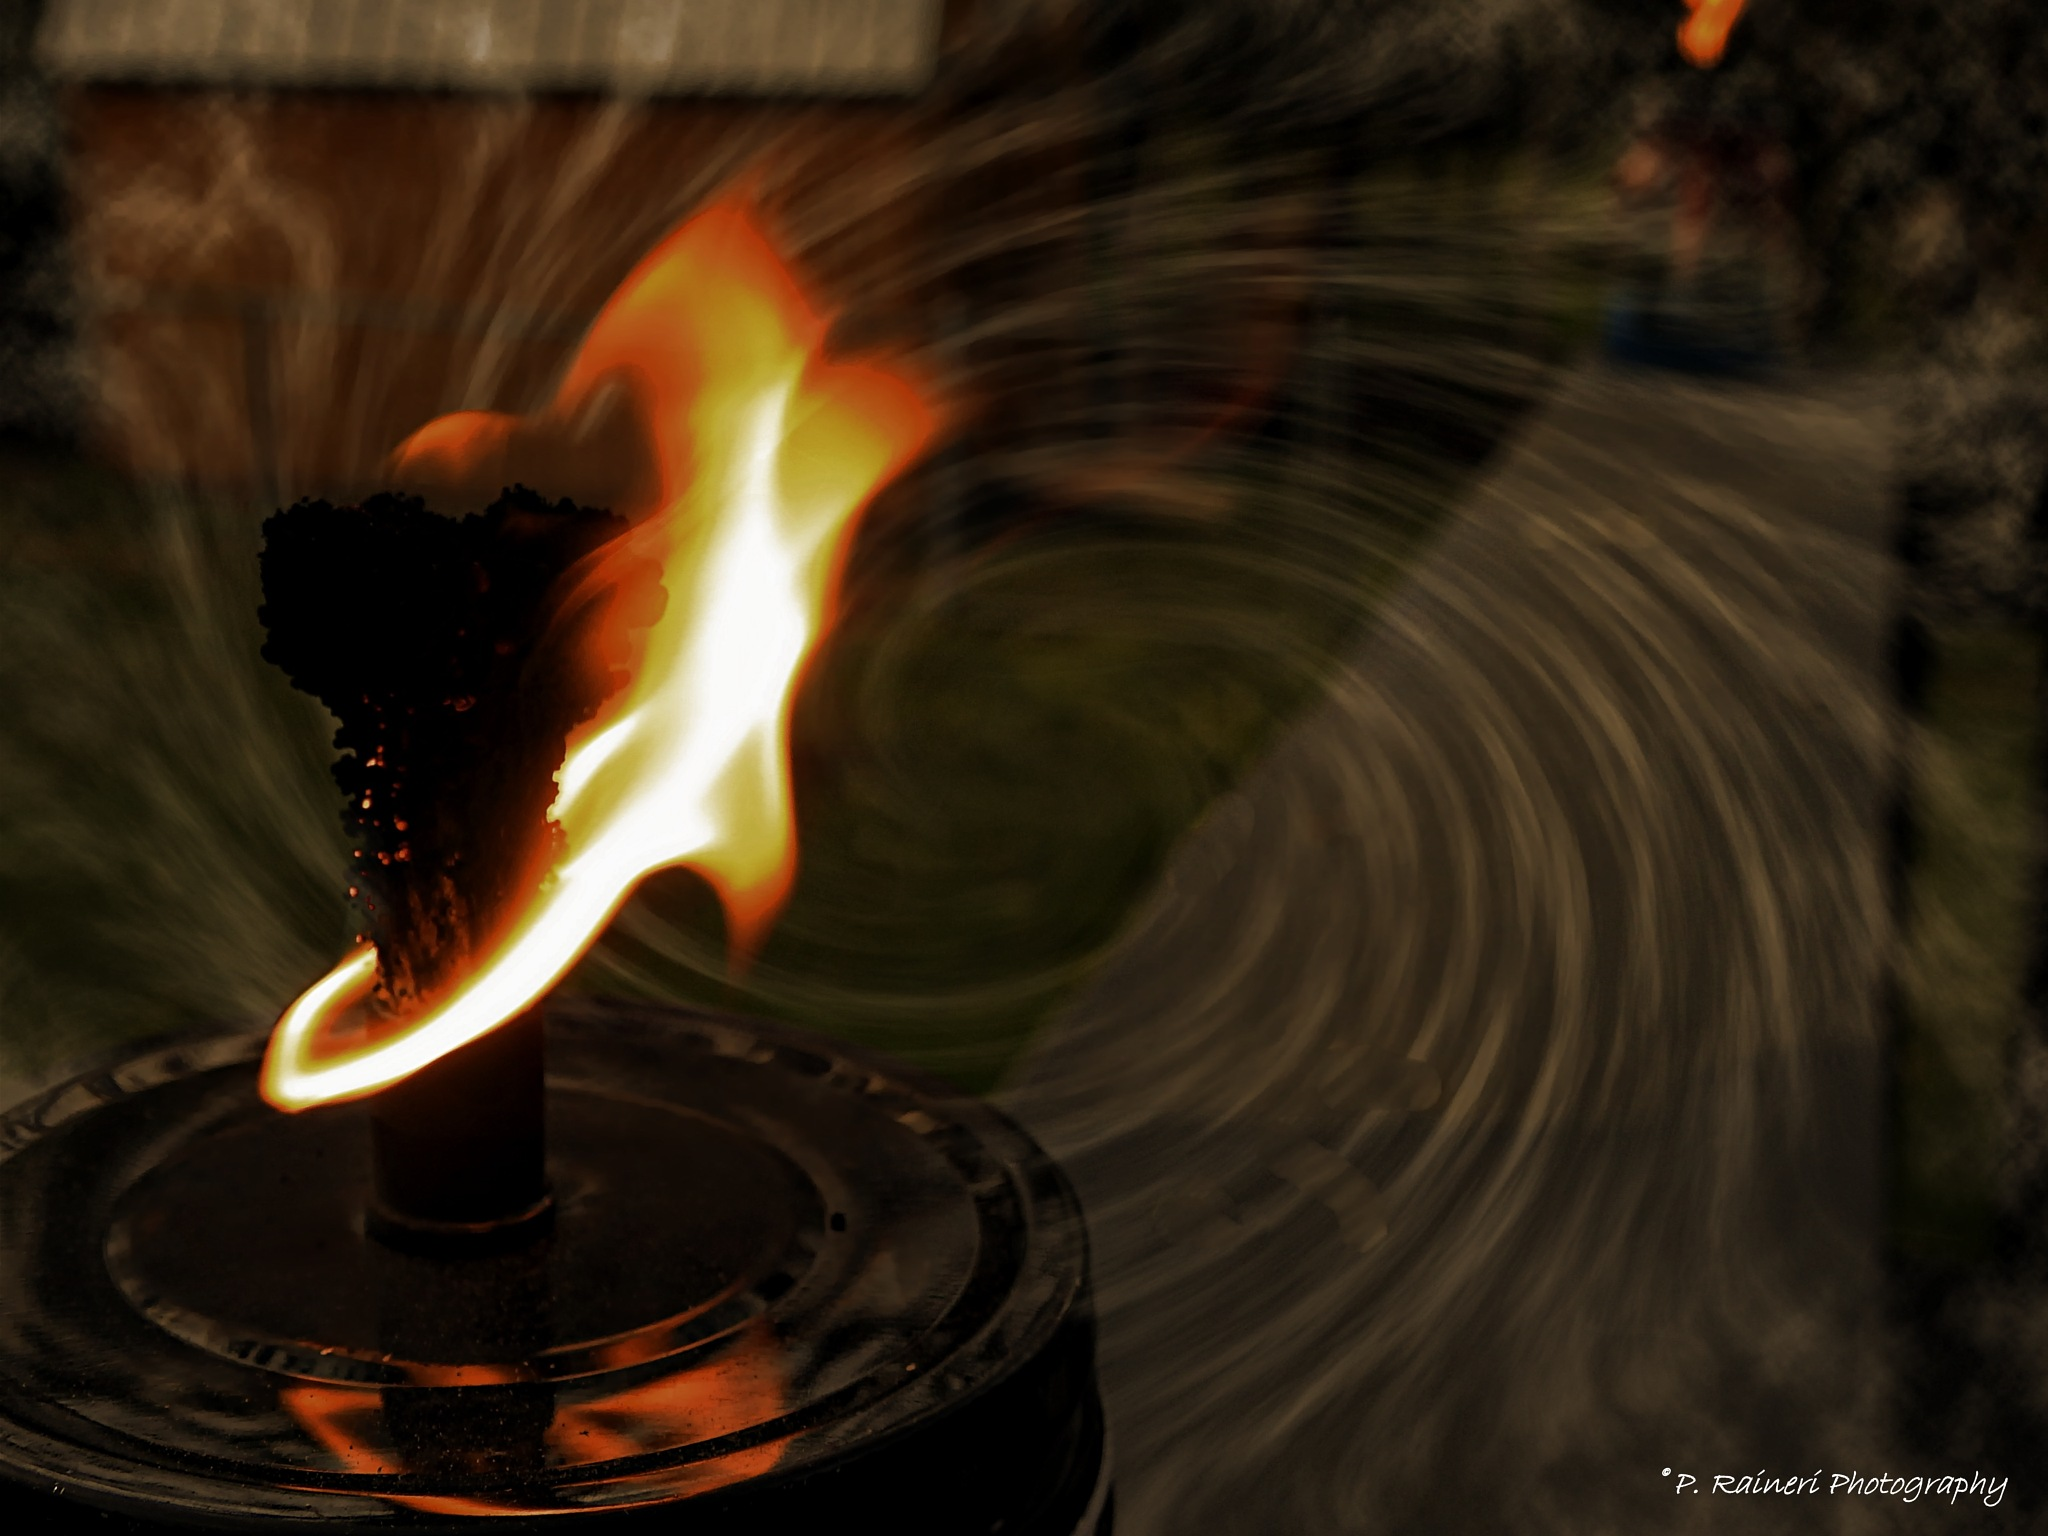 Flamer by pamela.raineri.1